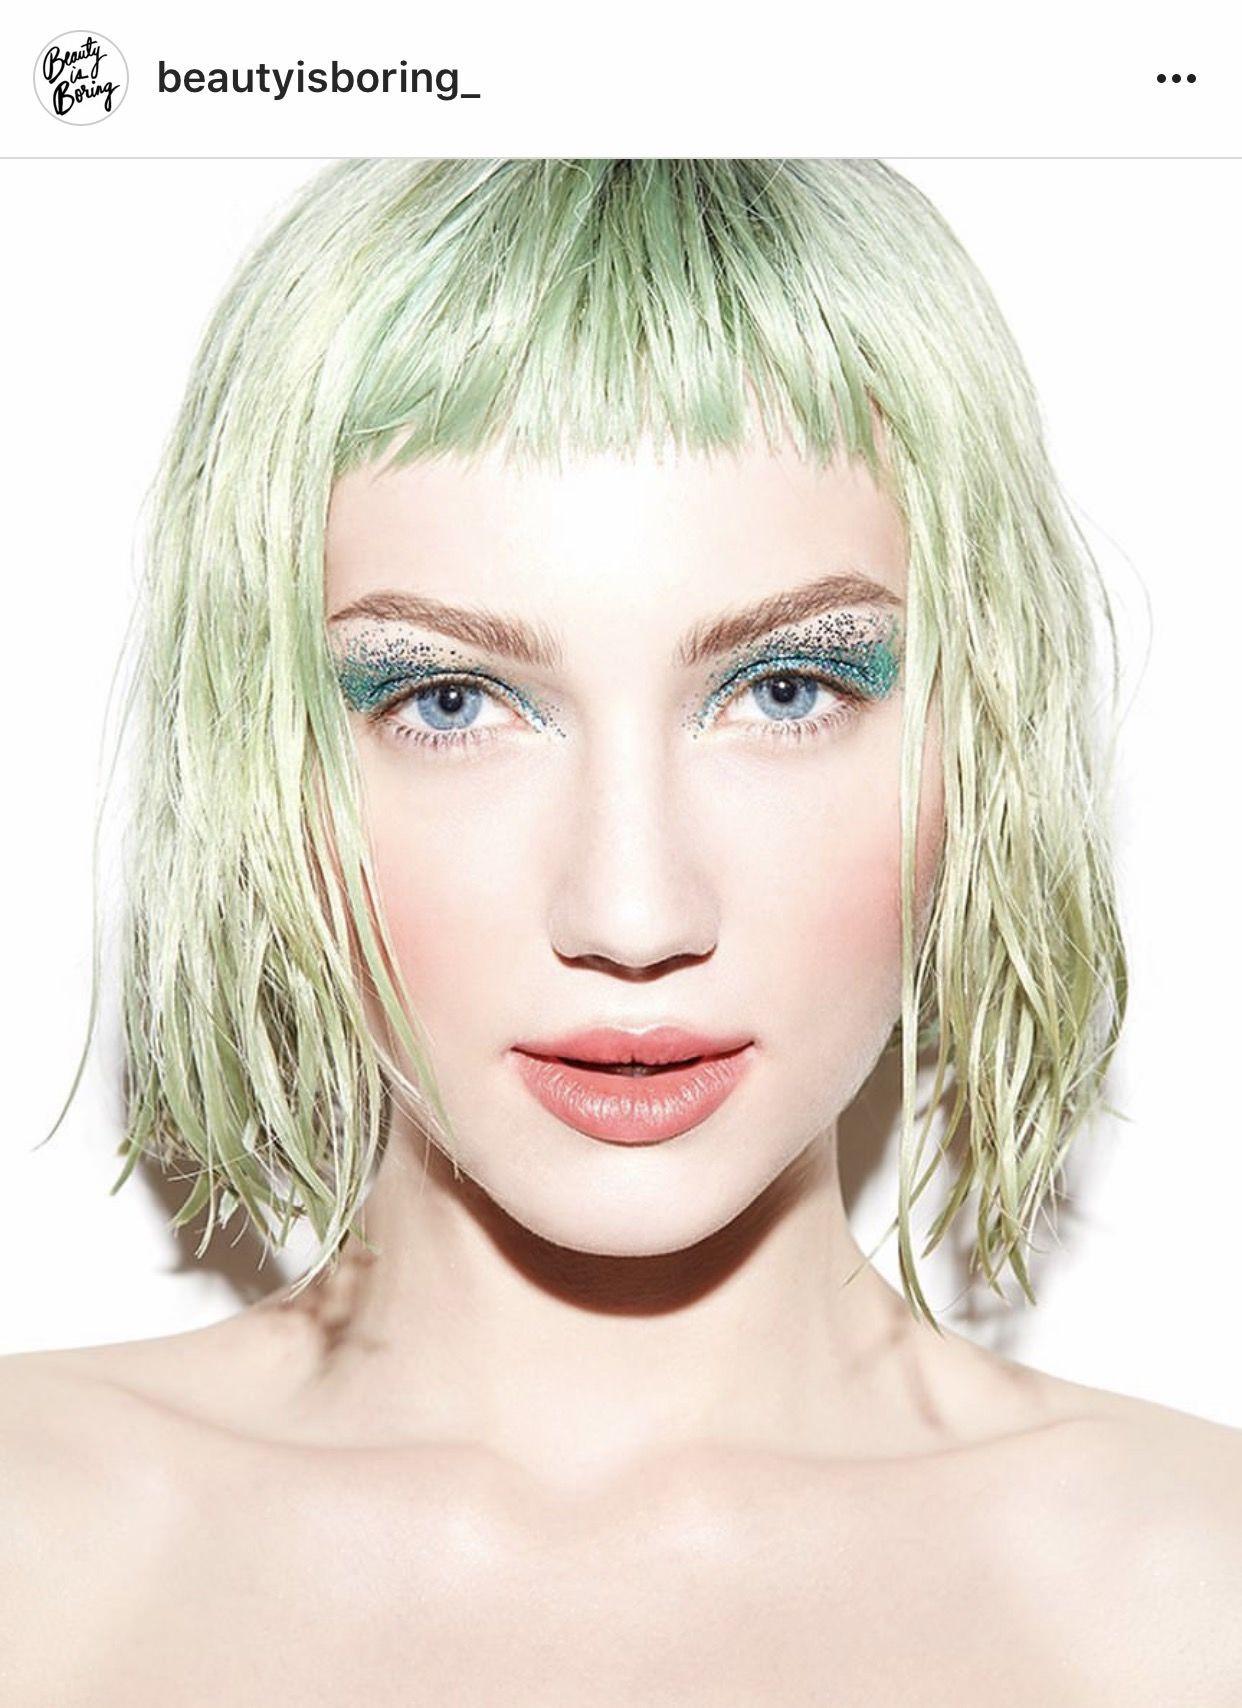 PRIVATE SCHOOL Spacepaste® Glitter Green hair, Braided